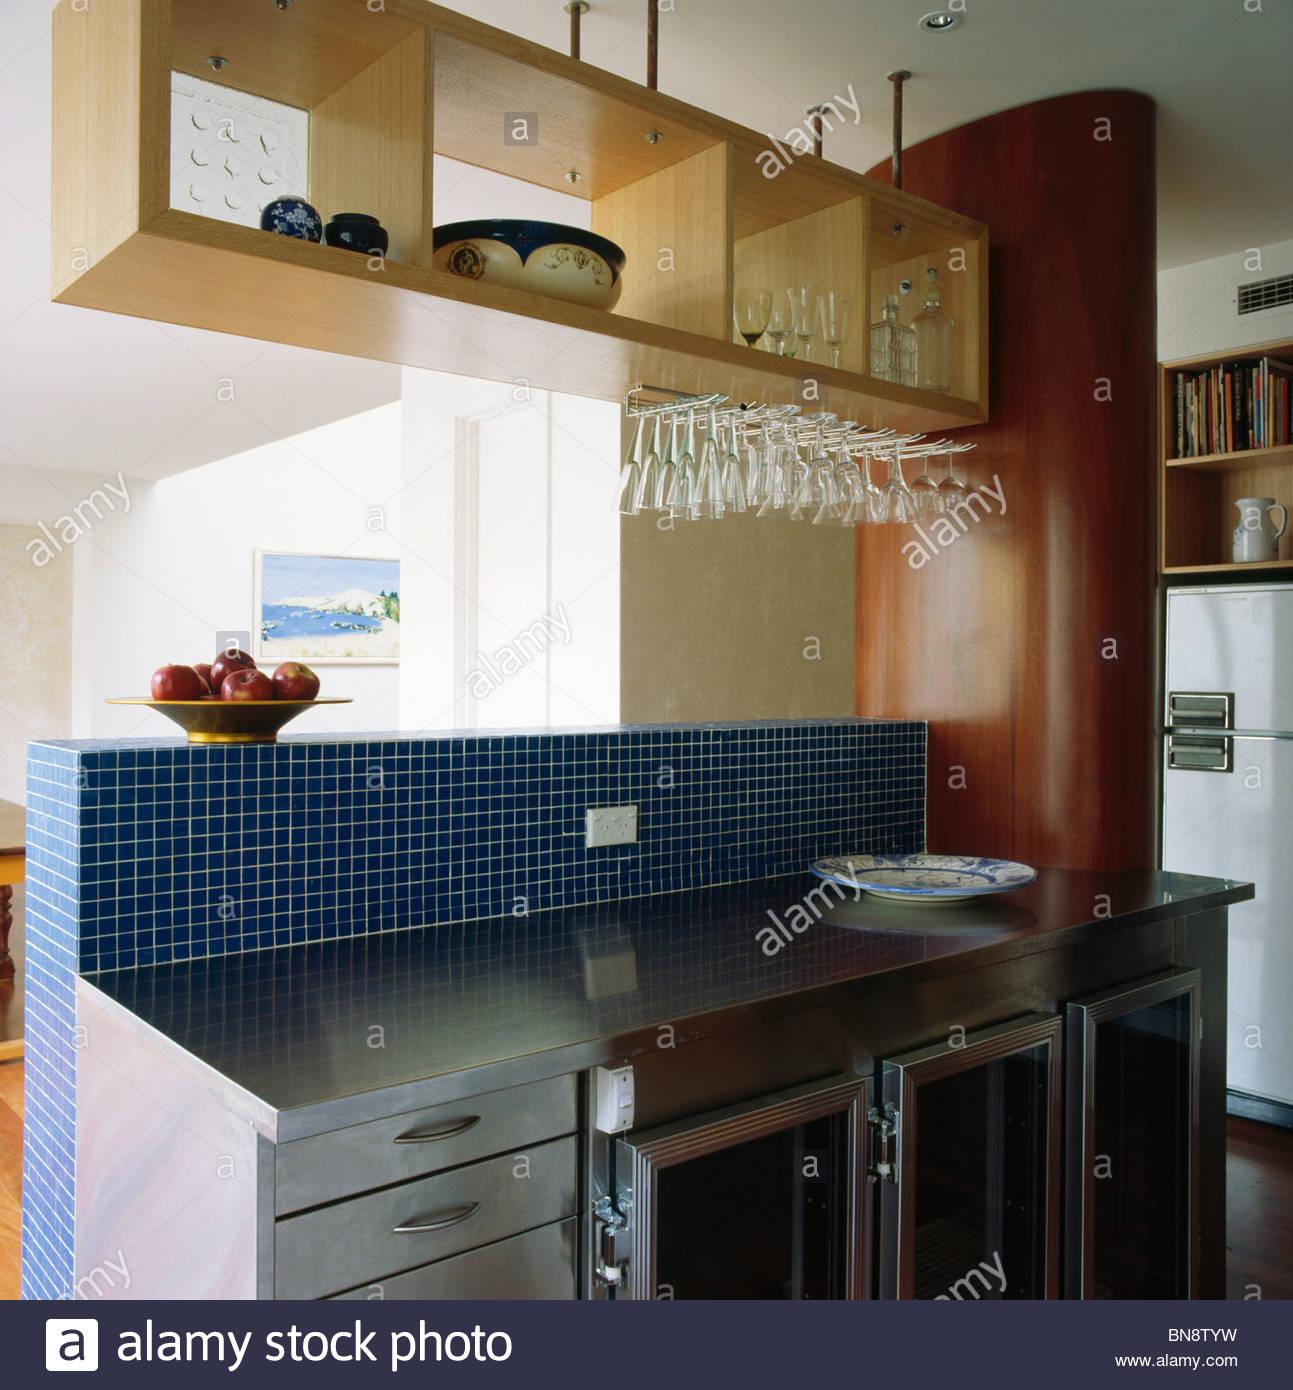 Full Size of Küche Aufbewahrung Wand Ikea Hacks Küche Aufbewahrung Küche Aufbewahrung Kunststoff Plastikfreie Küche Aufbewahrung Küche Küche Aufbewahrung